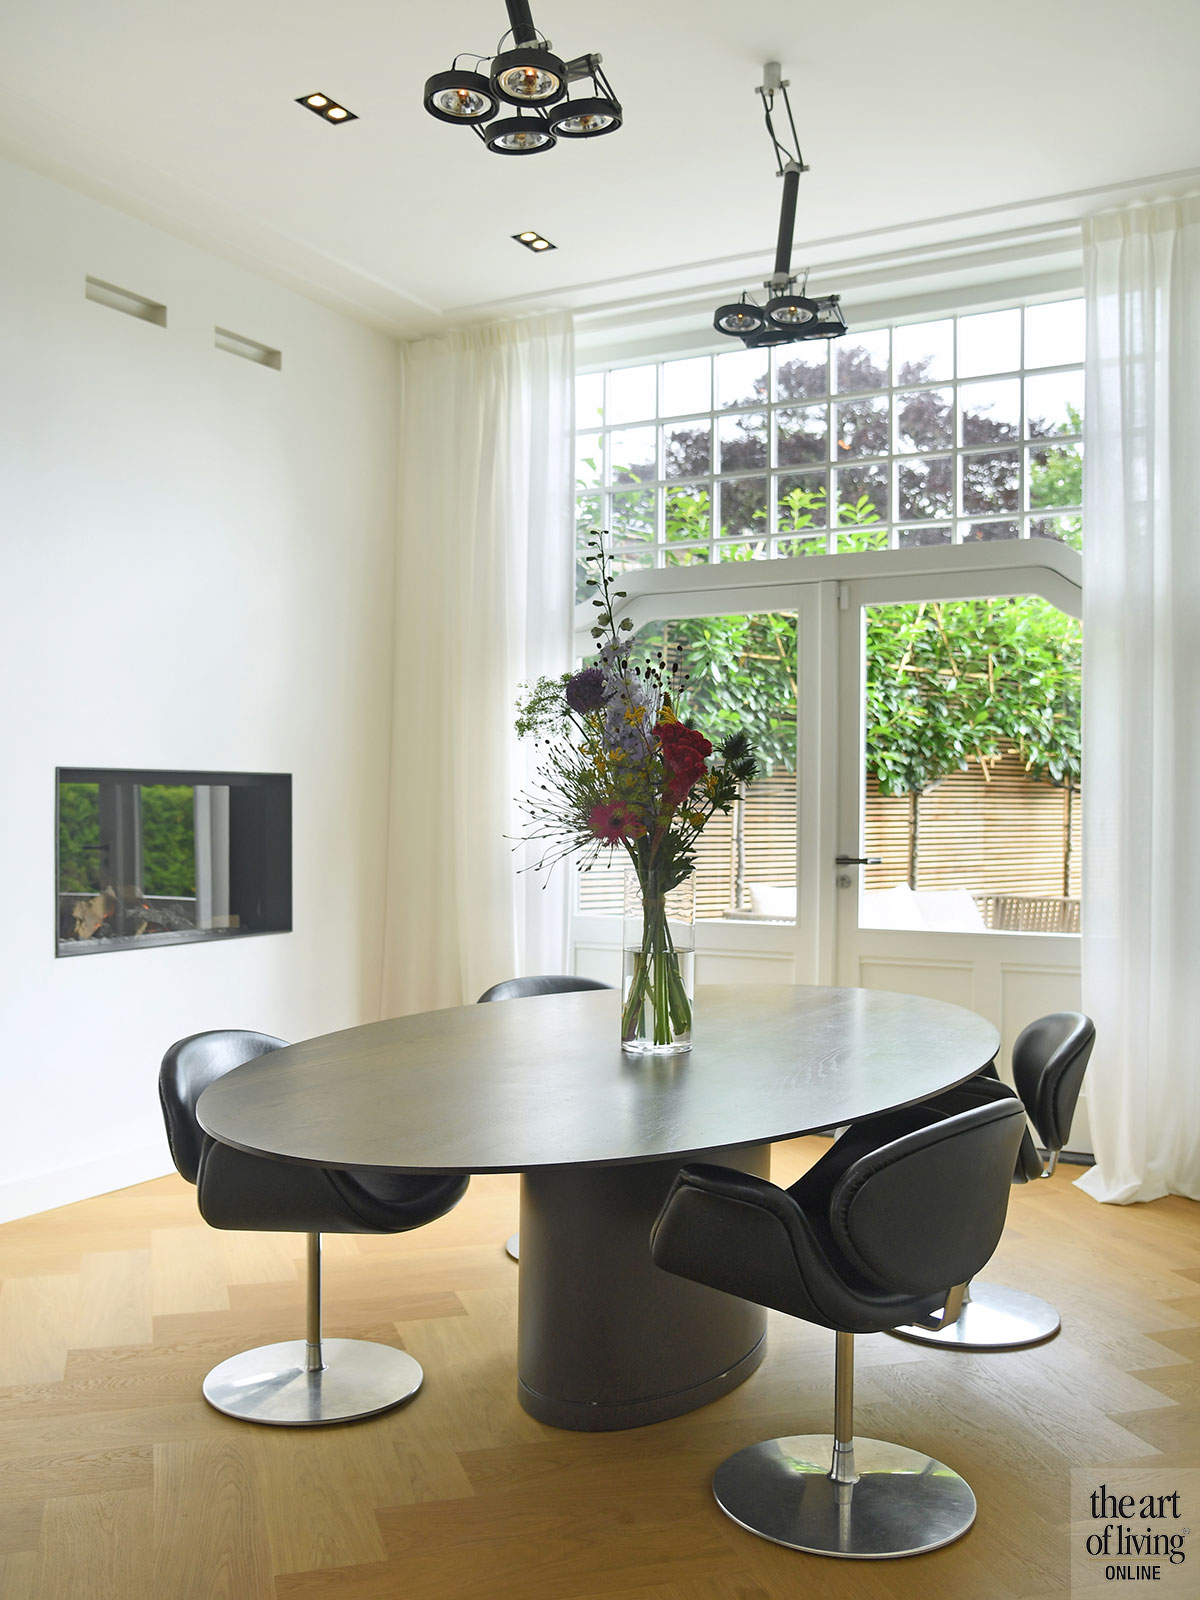 visgraatvloer | Vloeren Exclusief oestgeest, the art of living